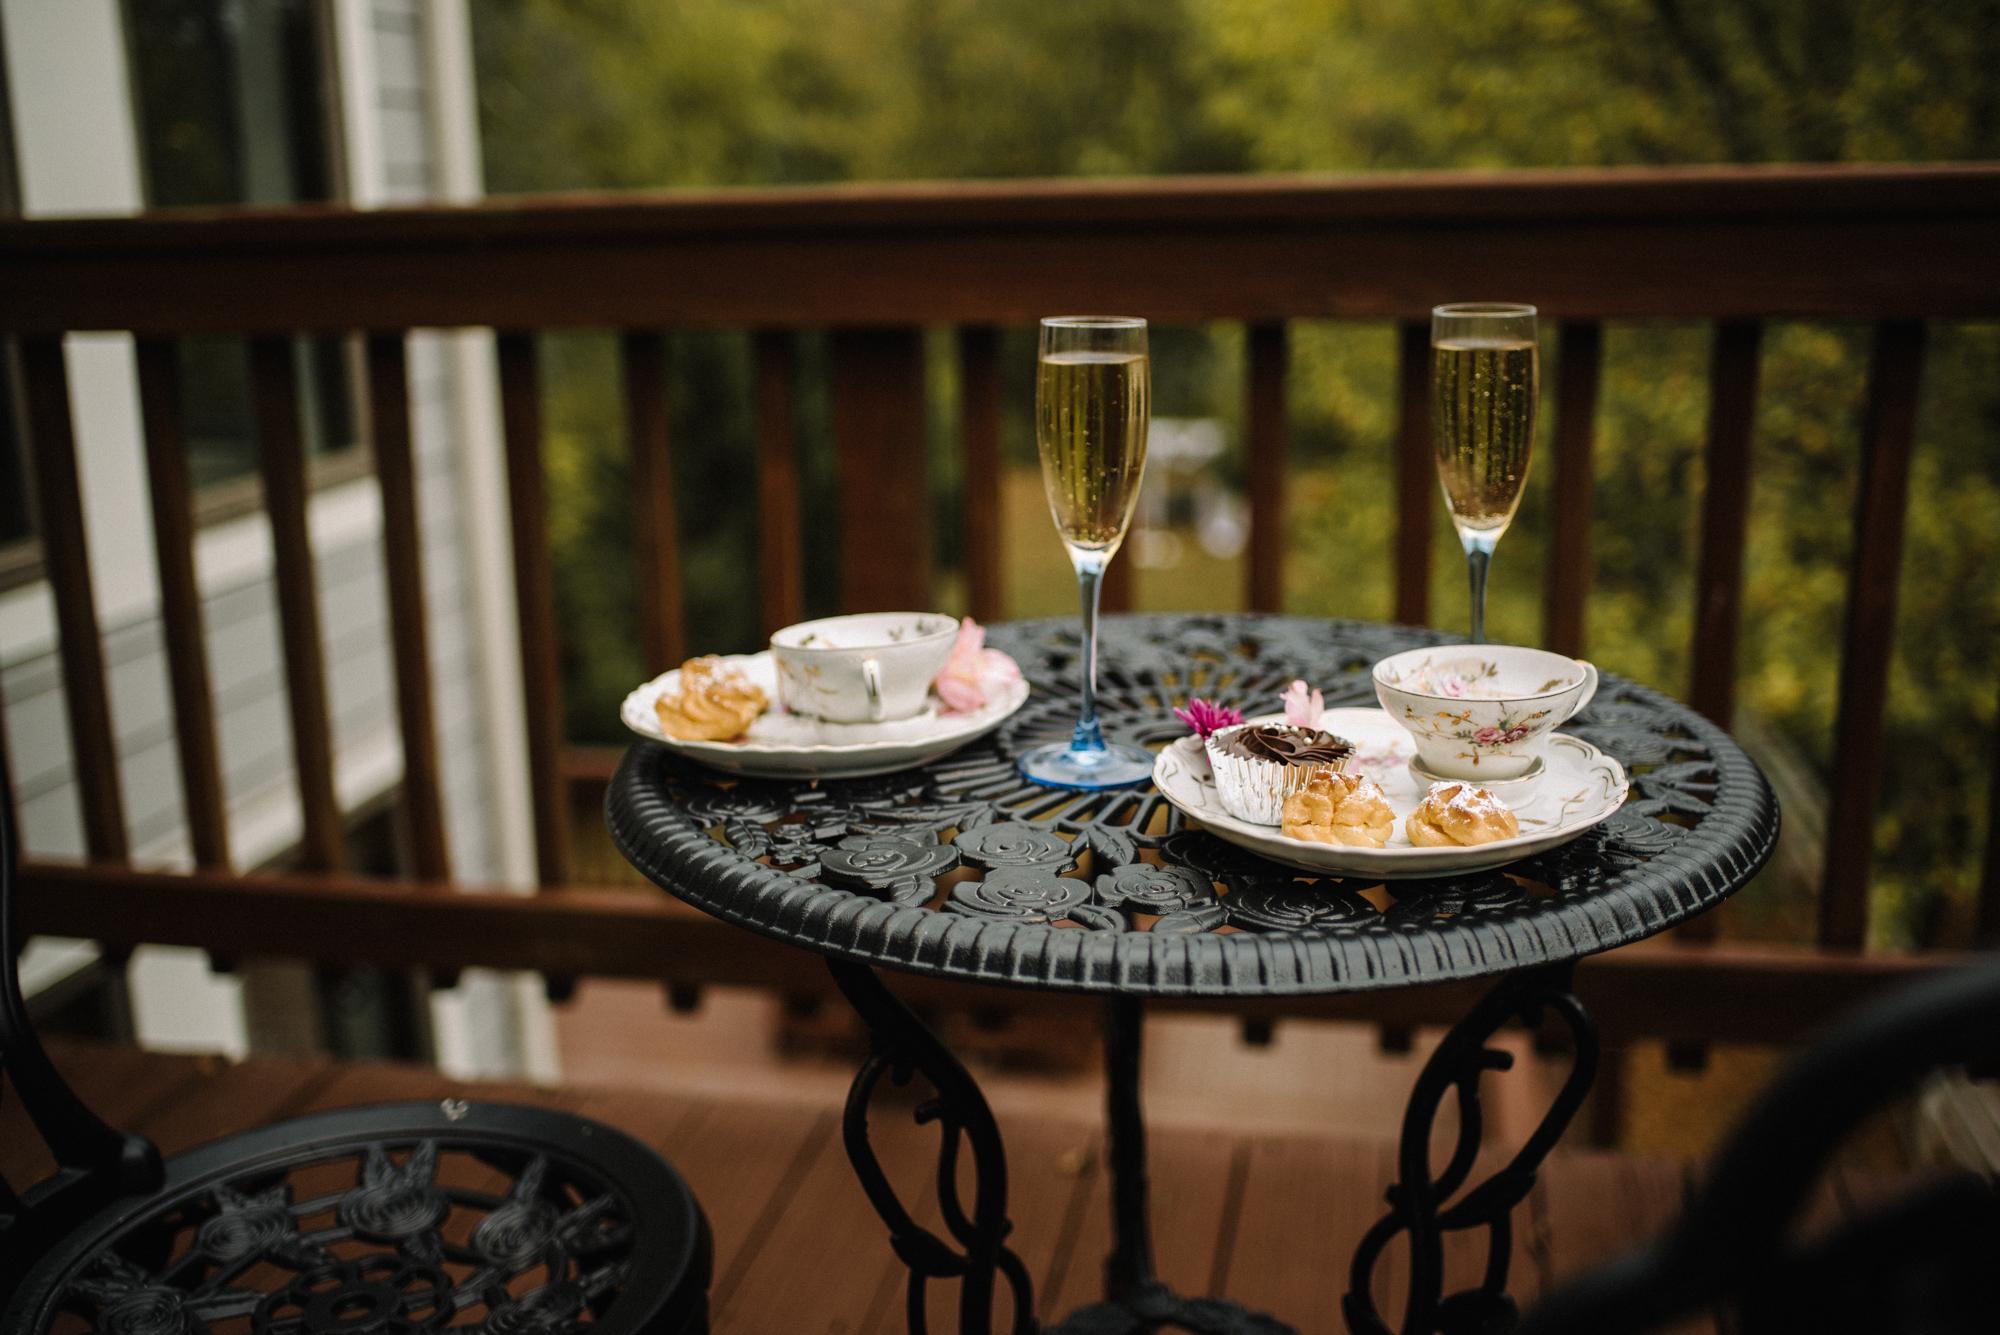 Mandi-and-Jordan-Intimate-Backyard-River-Wedding-Shenandoah-Valley_1.JPG